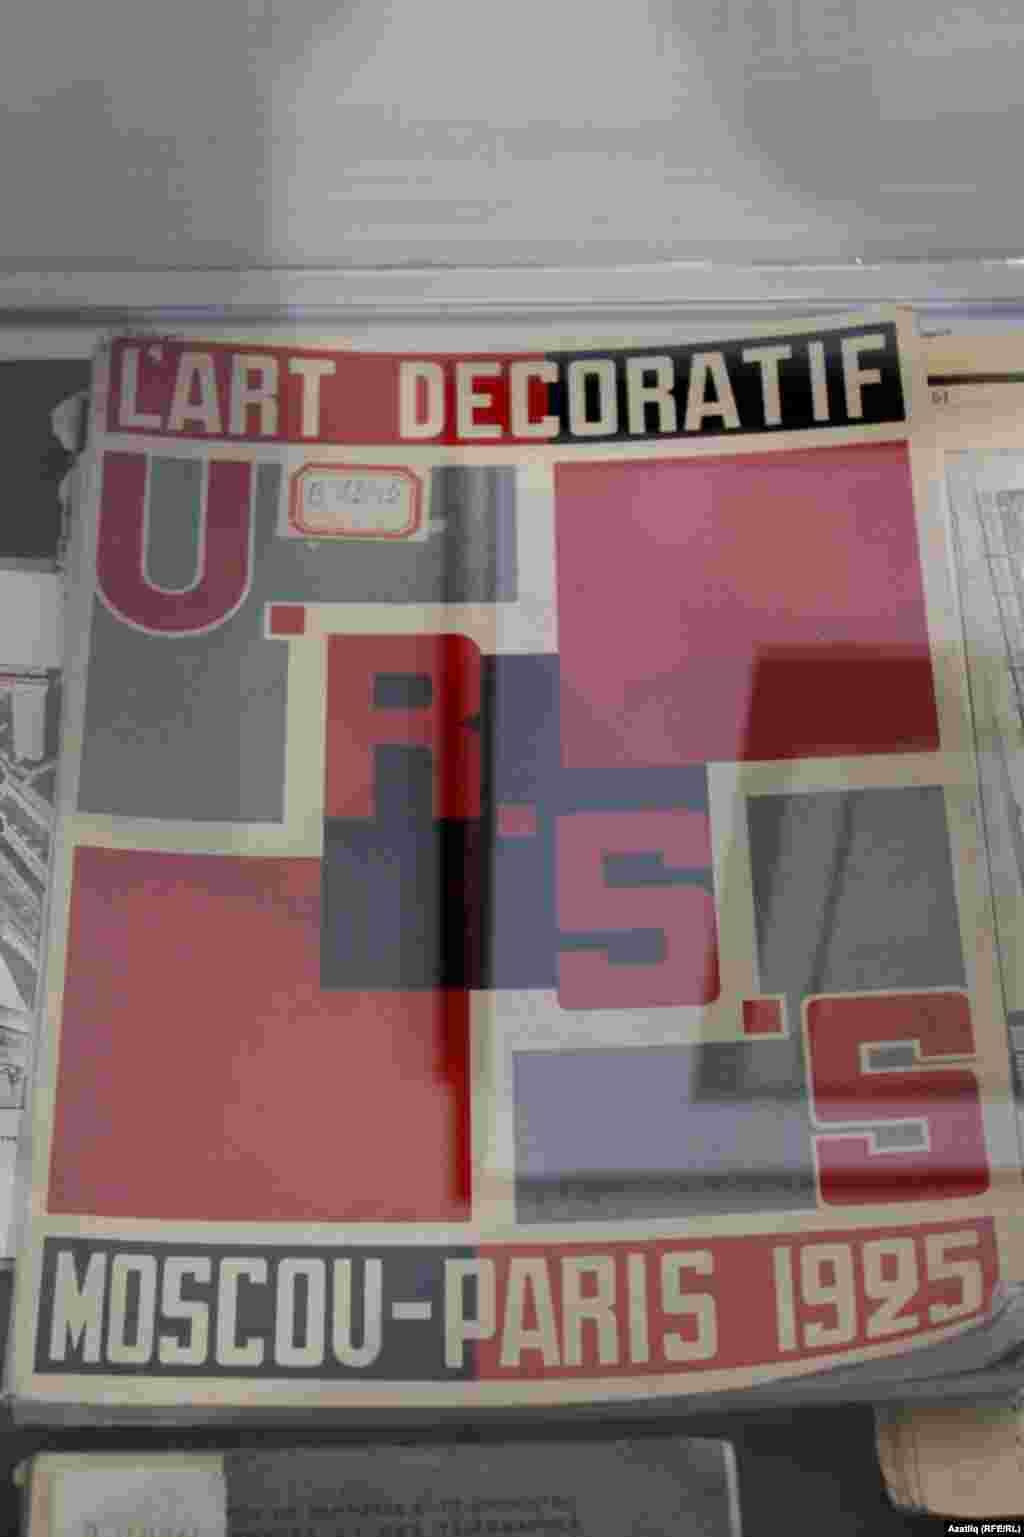 Декоратив сәнгатьләр халыкара күргәзмәсенең каталогы. Париж, 1925 ел.